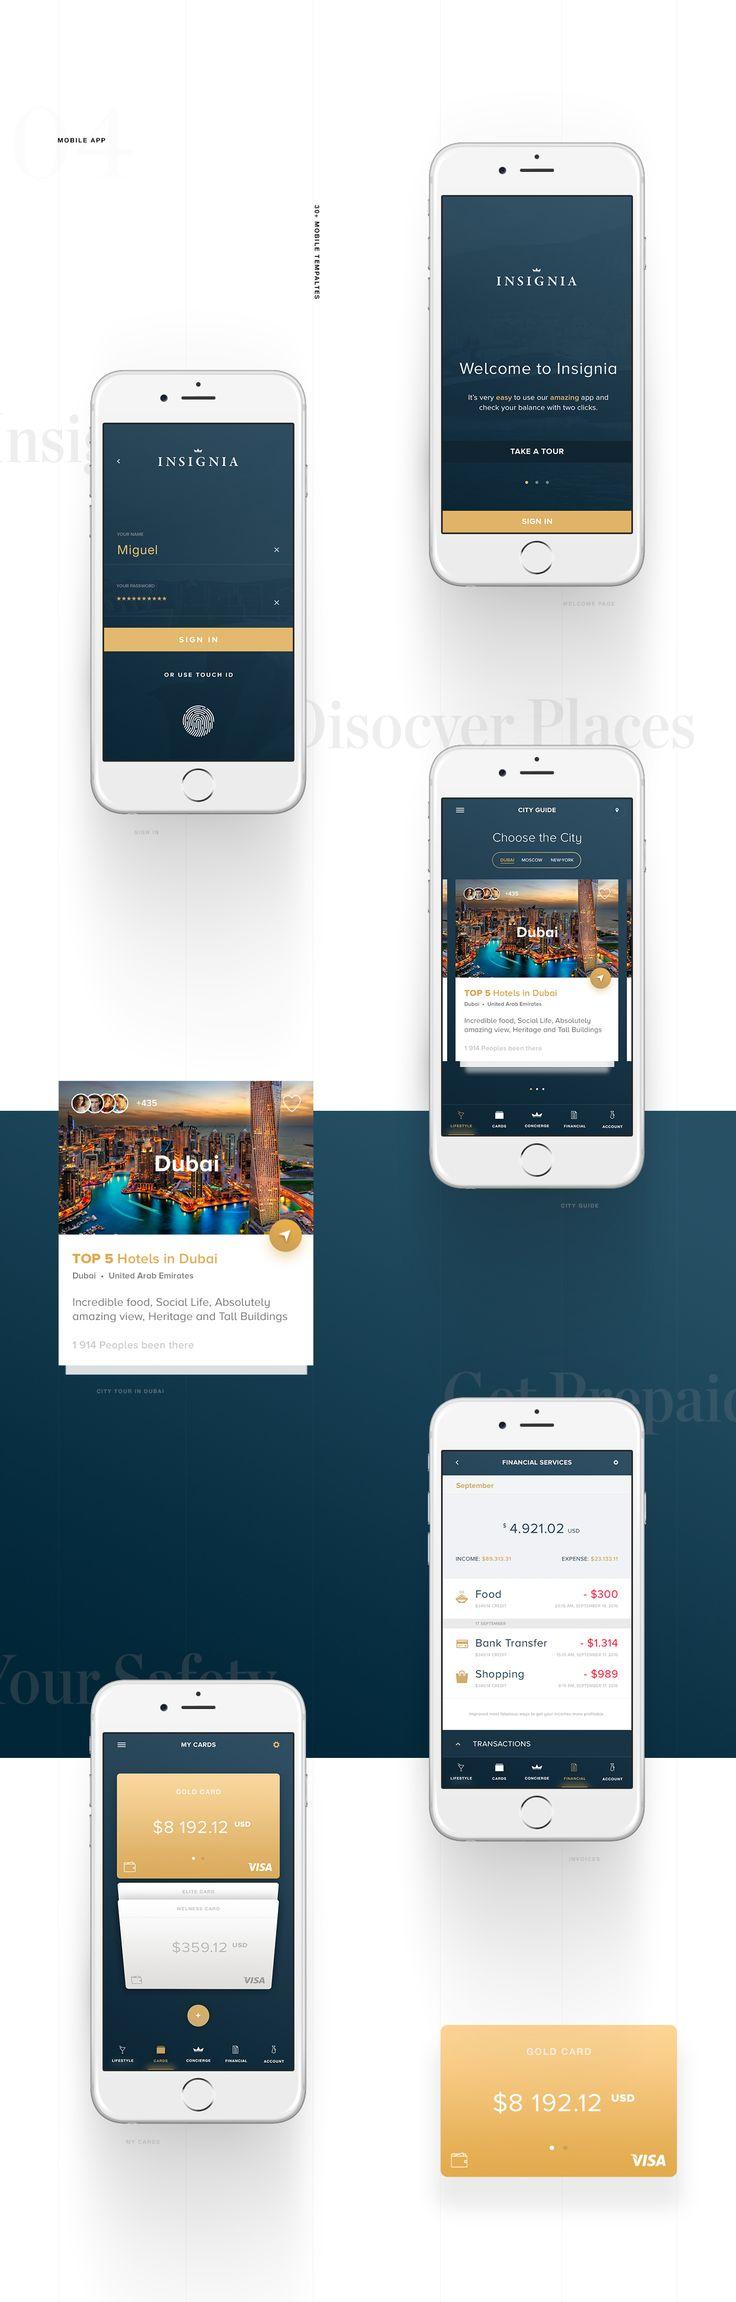 Insignia concierge (London) app & corporate site design on Behance